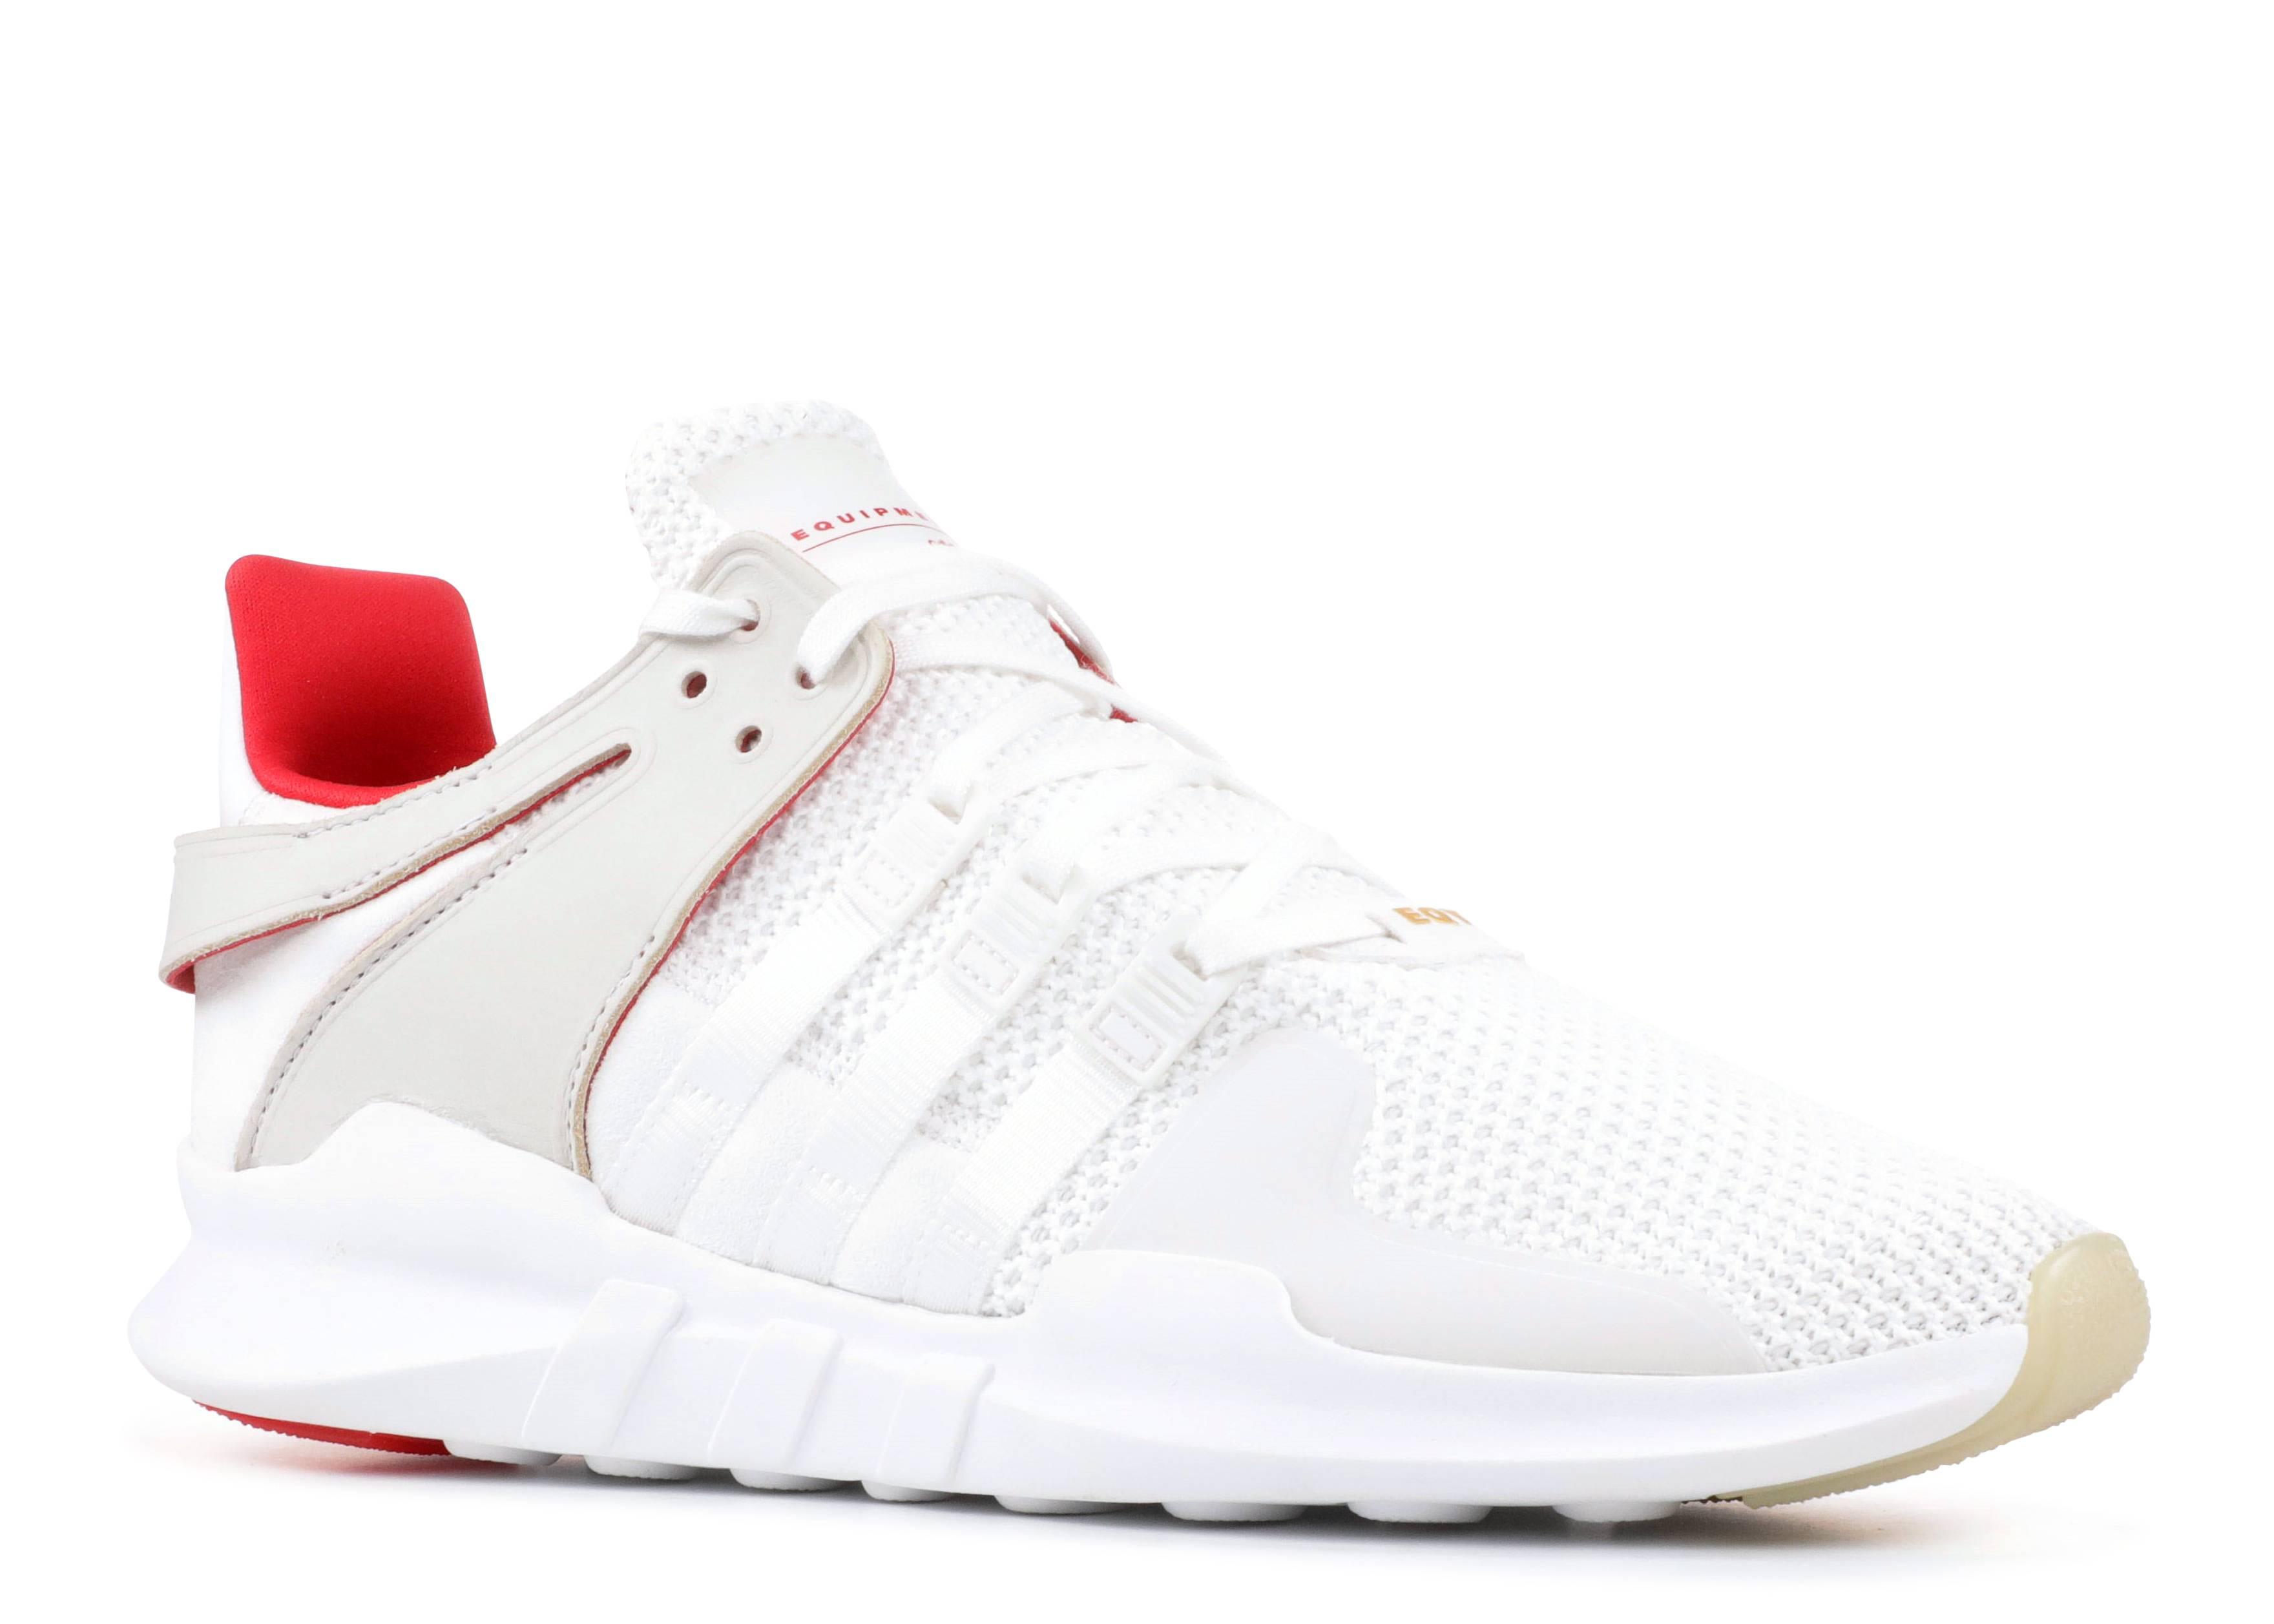 separation shoes 3b7af 761e2 Eqt Support Adv Cny